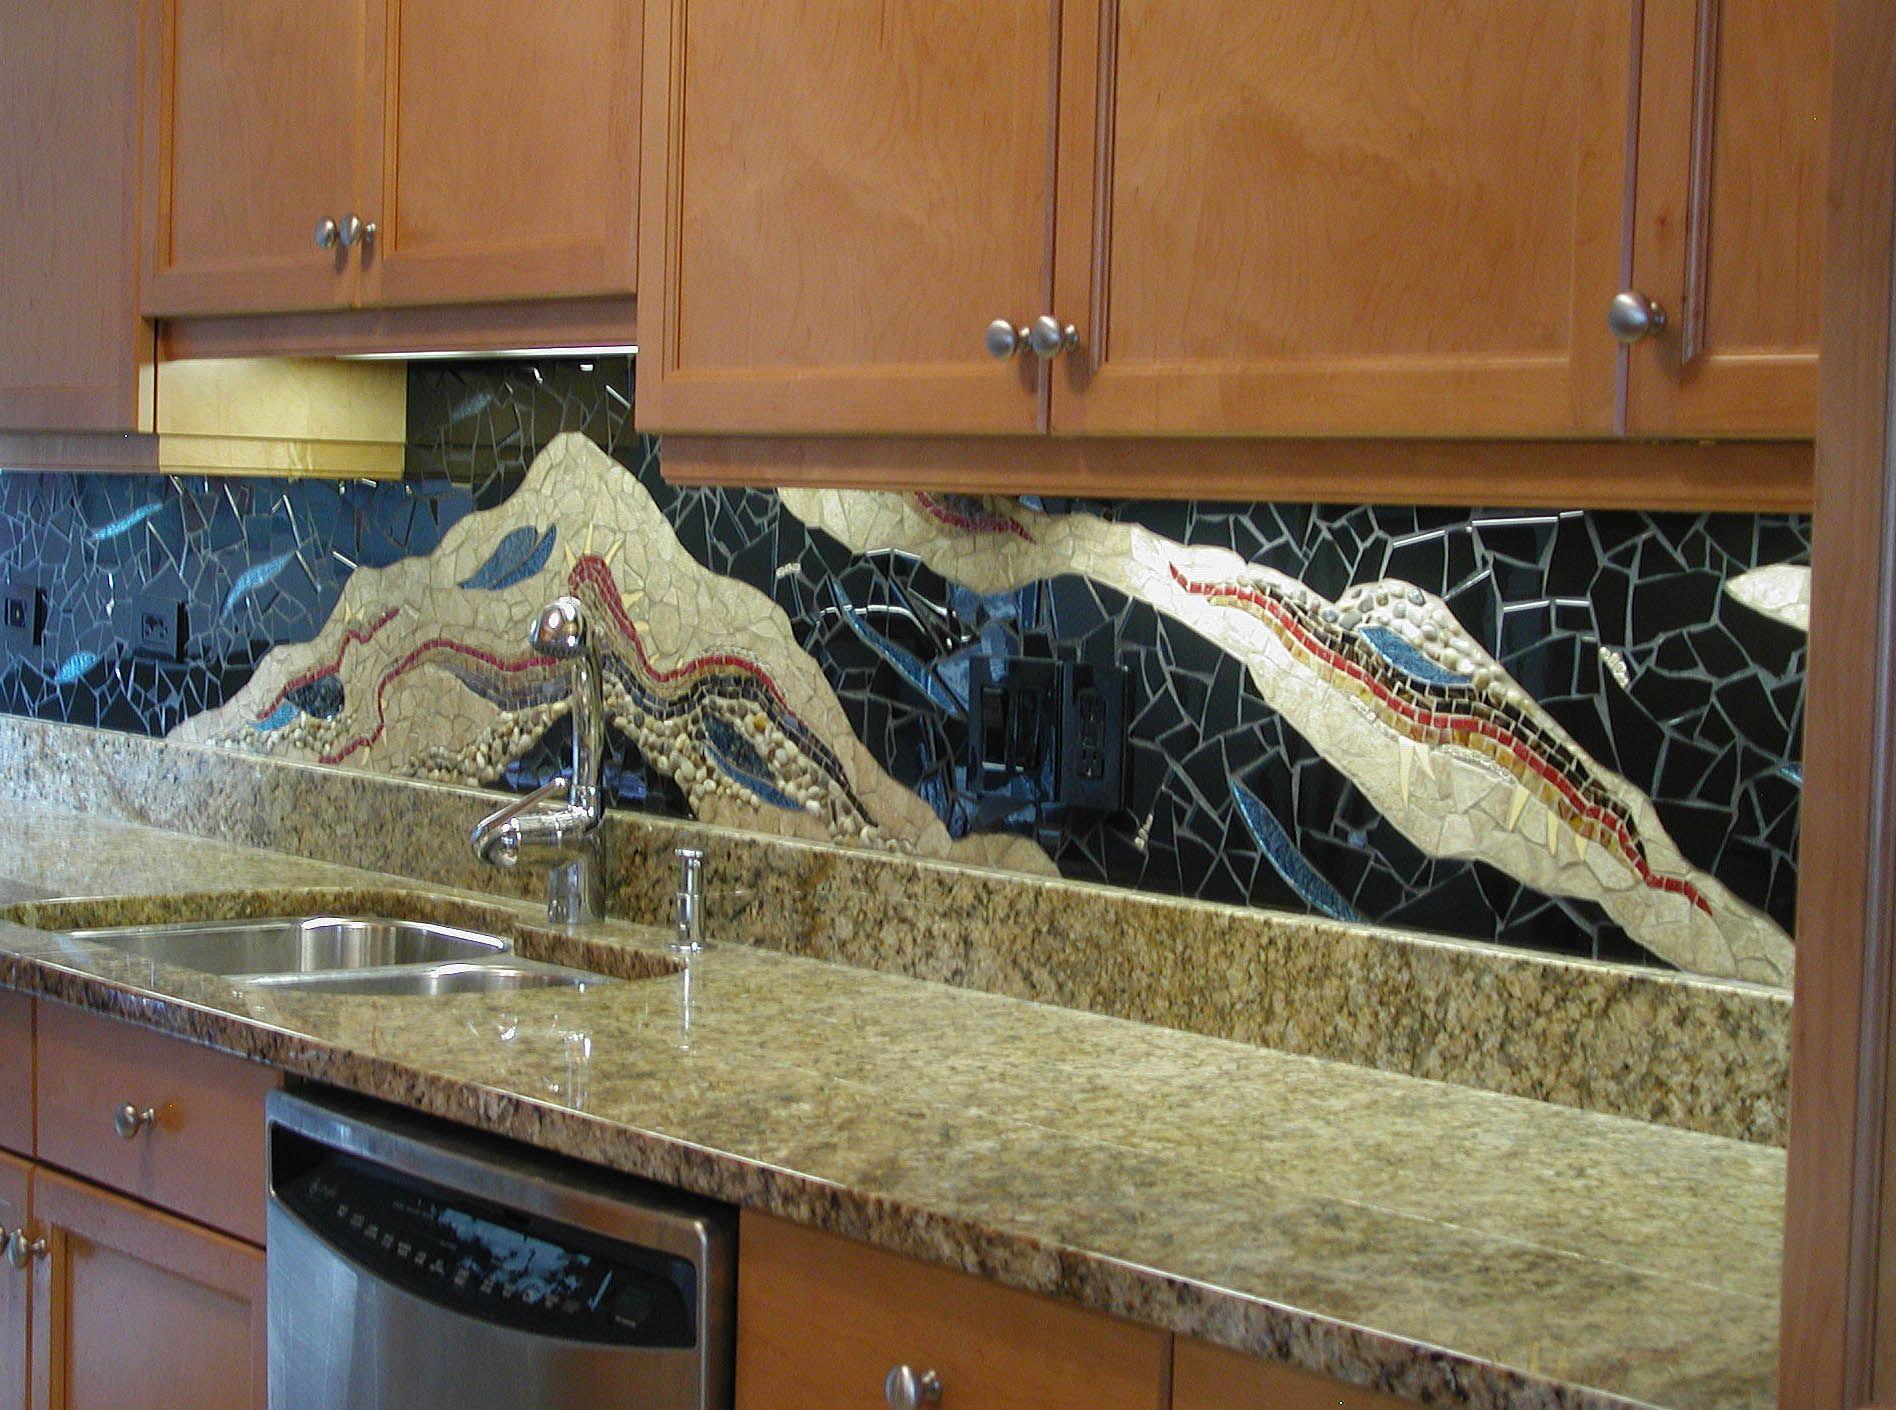 Easy Bathroom Backsplash Ideas Captivating Kitchen Backsplashes  Kitchen Remodel Designs Mosaic Backsplash Design Ideas